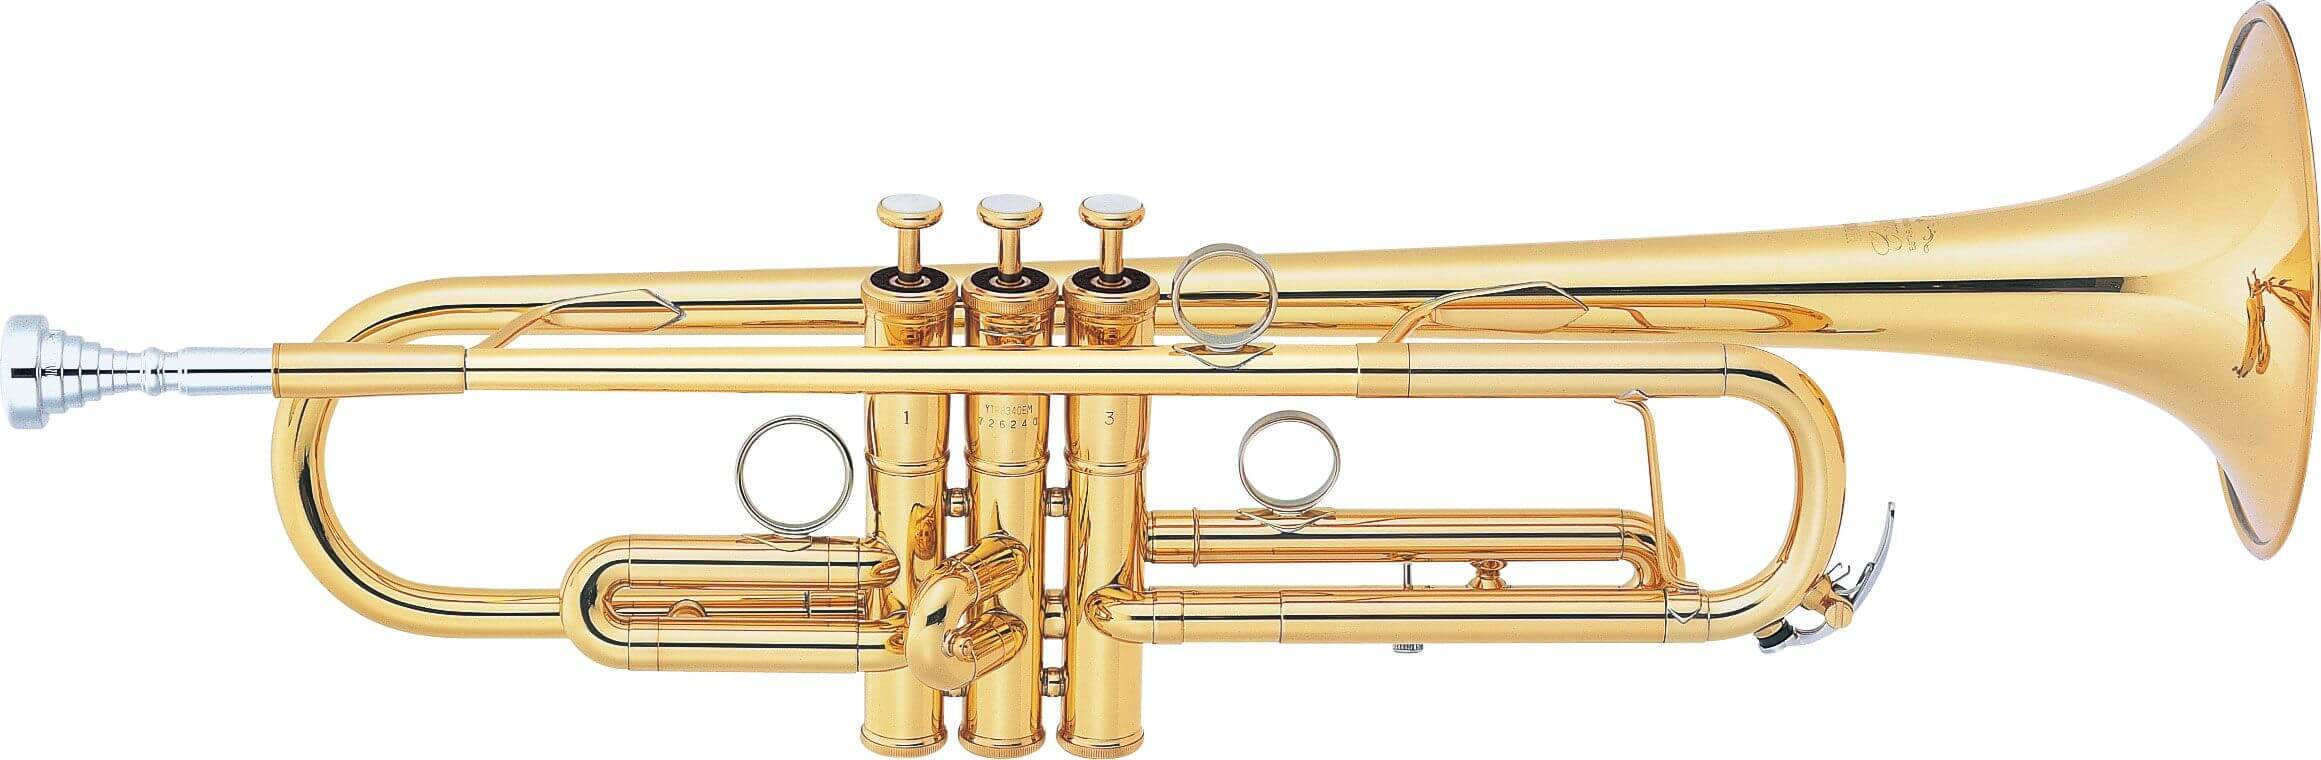 Trompeta Yamaha Ytr-8340EM Lacada